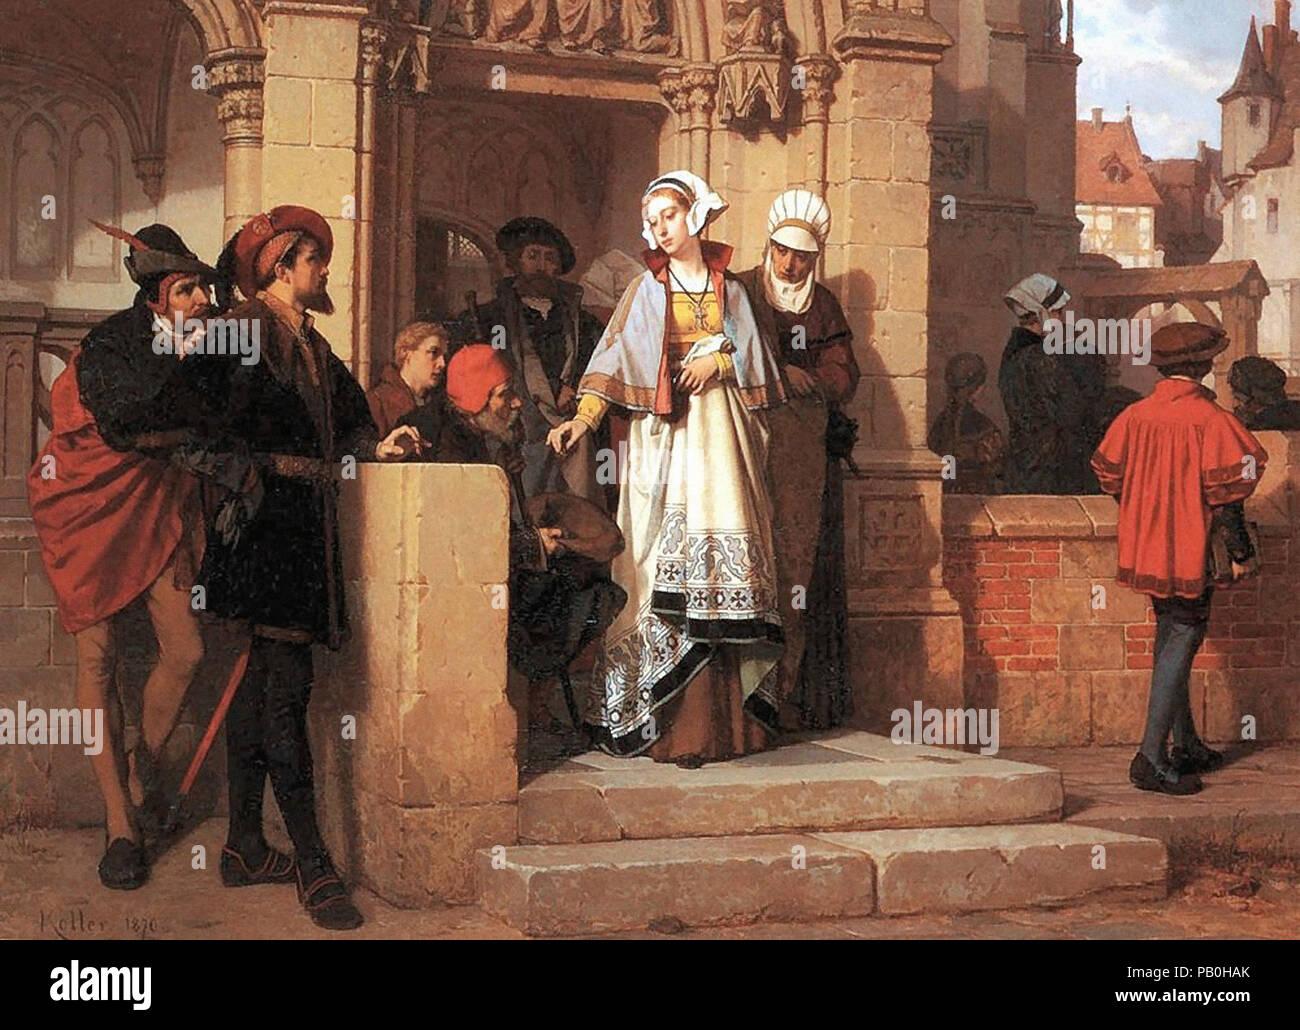 Faust gretchen Gretchen (Faust